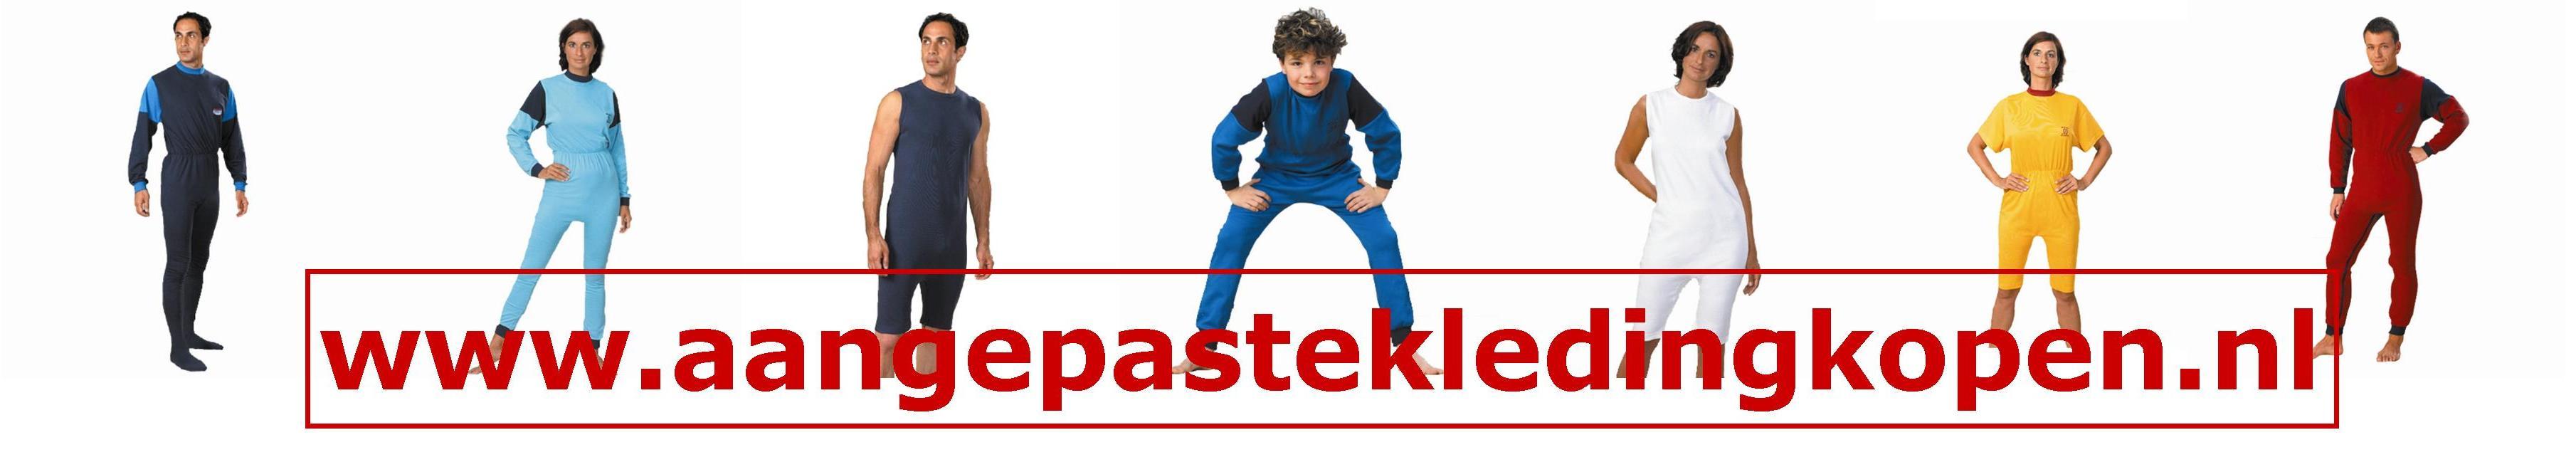 logo www.aangepastekledingkopen.nl